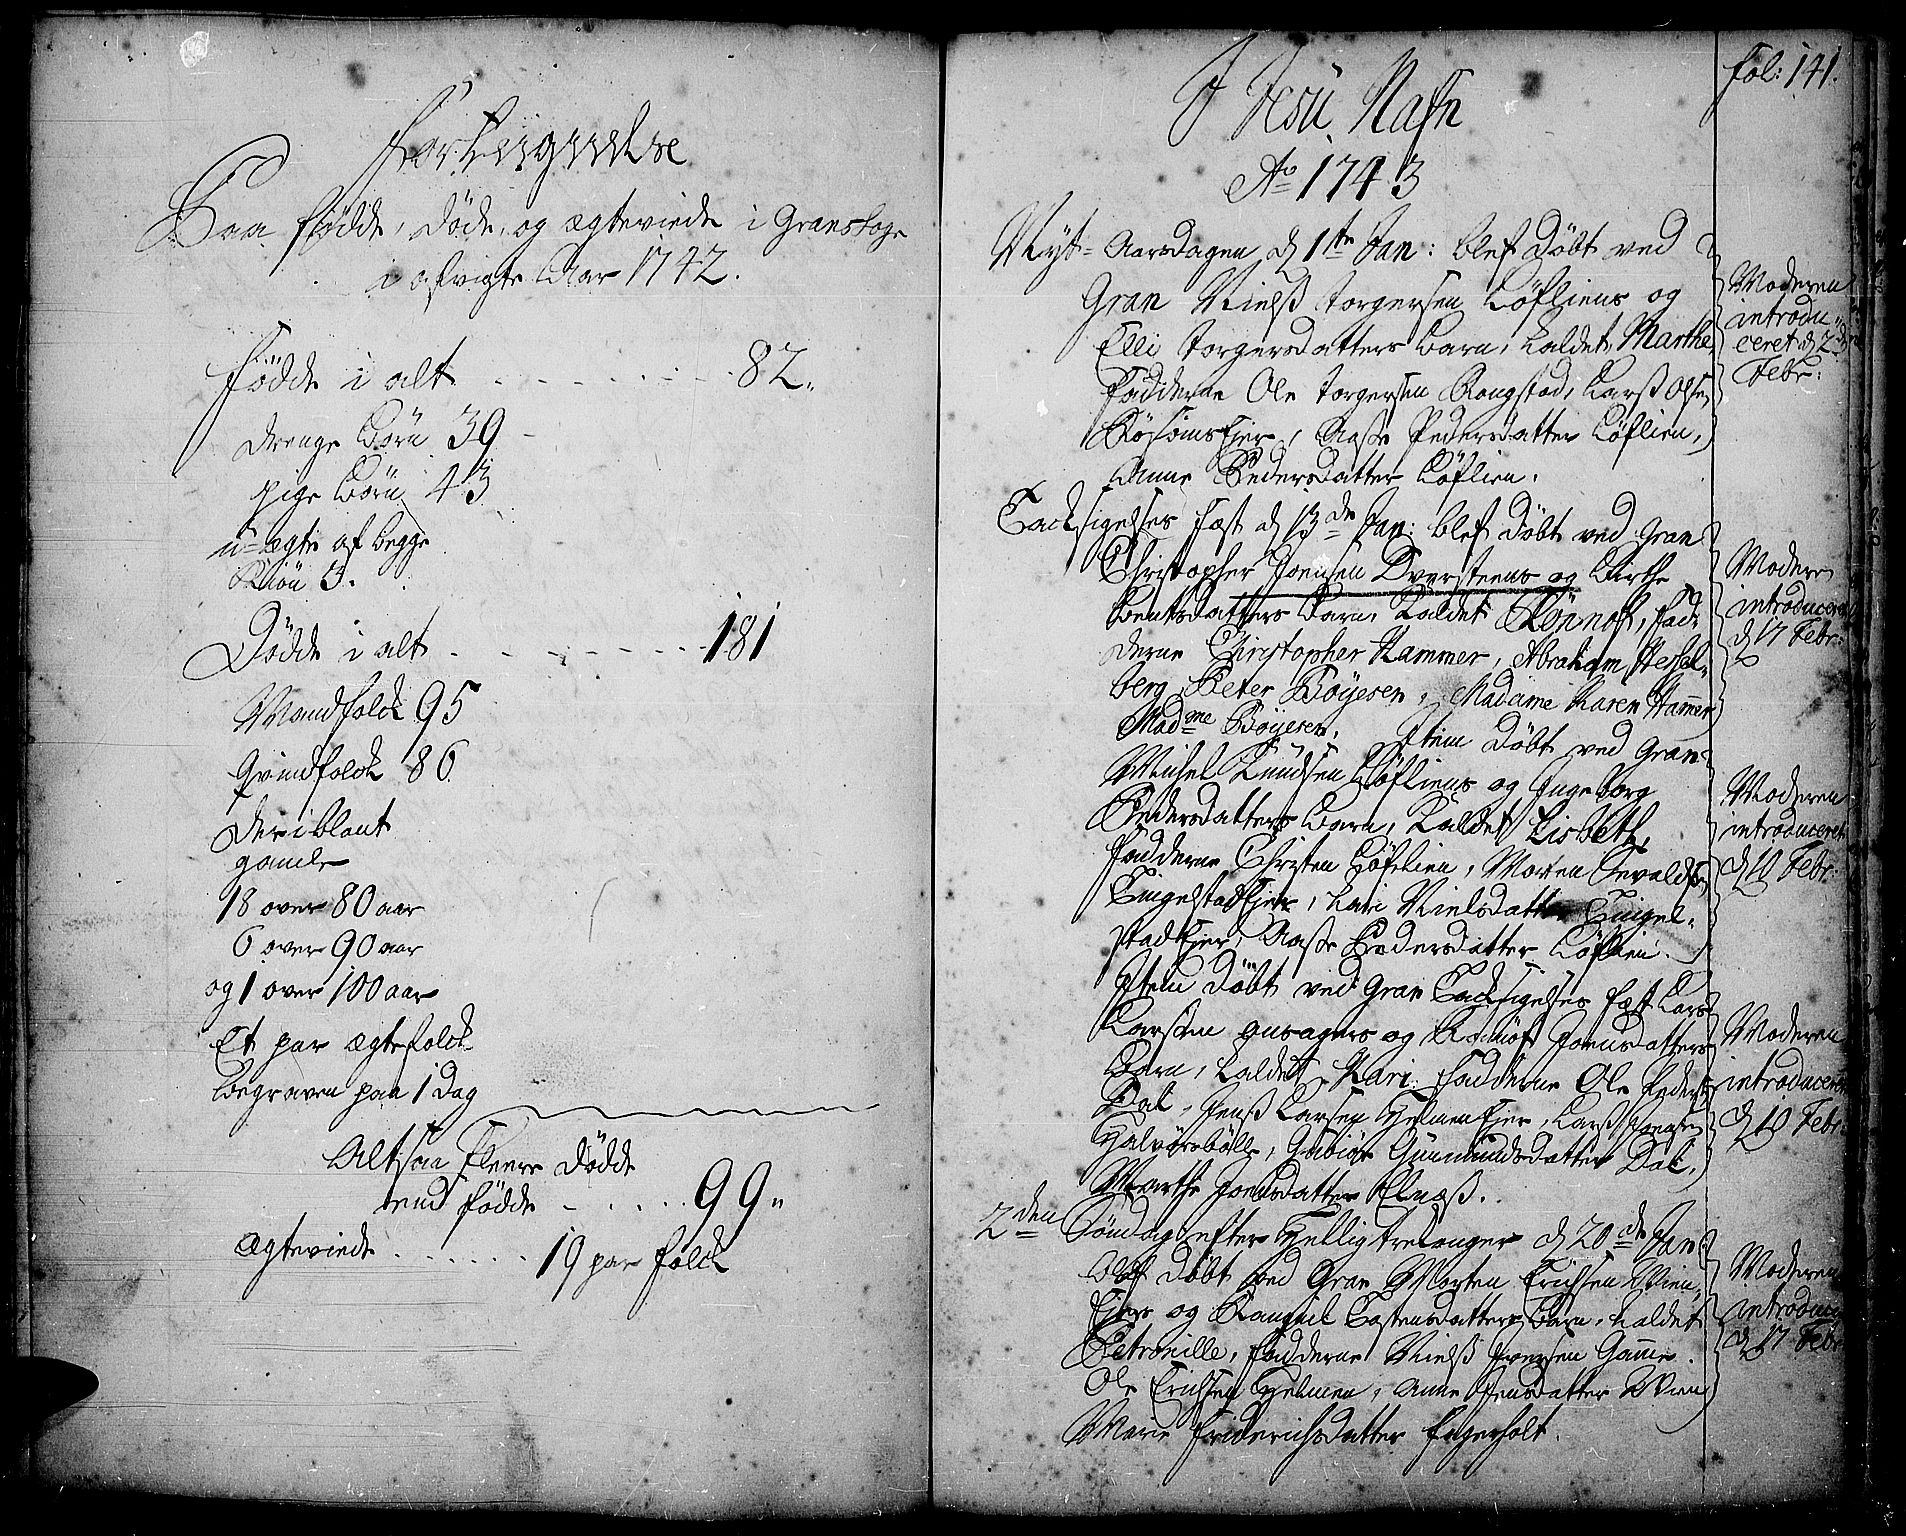 SAH, Gran prestekontor, Ministerialbok nr. 2, 1732-1744, s. 141